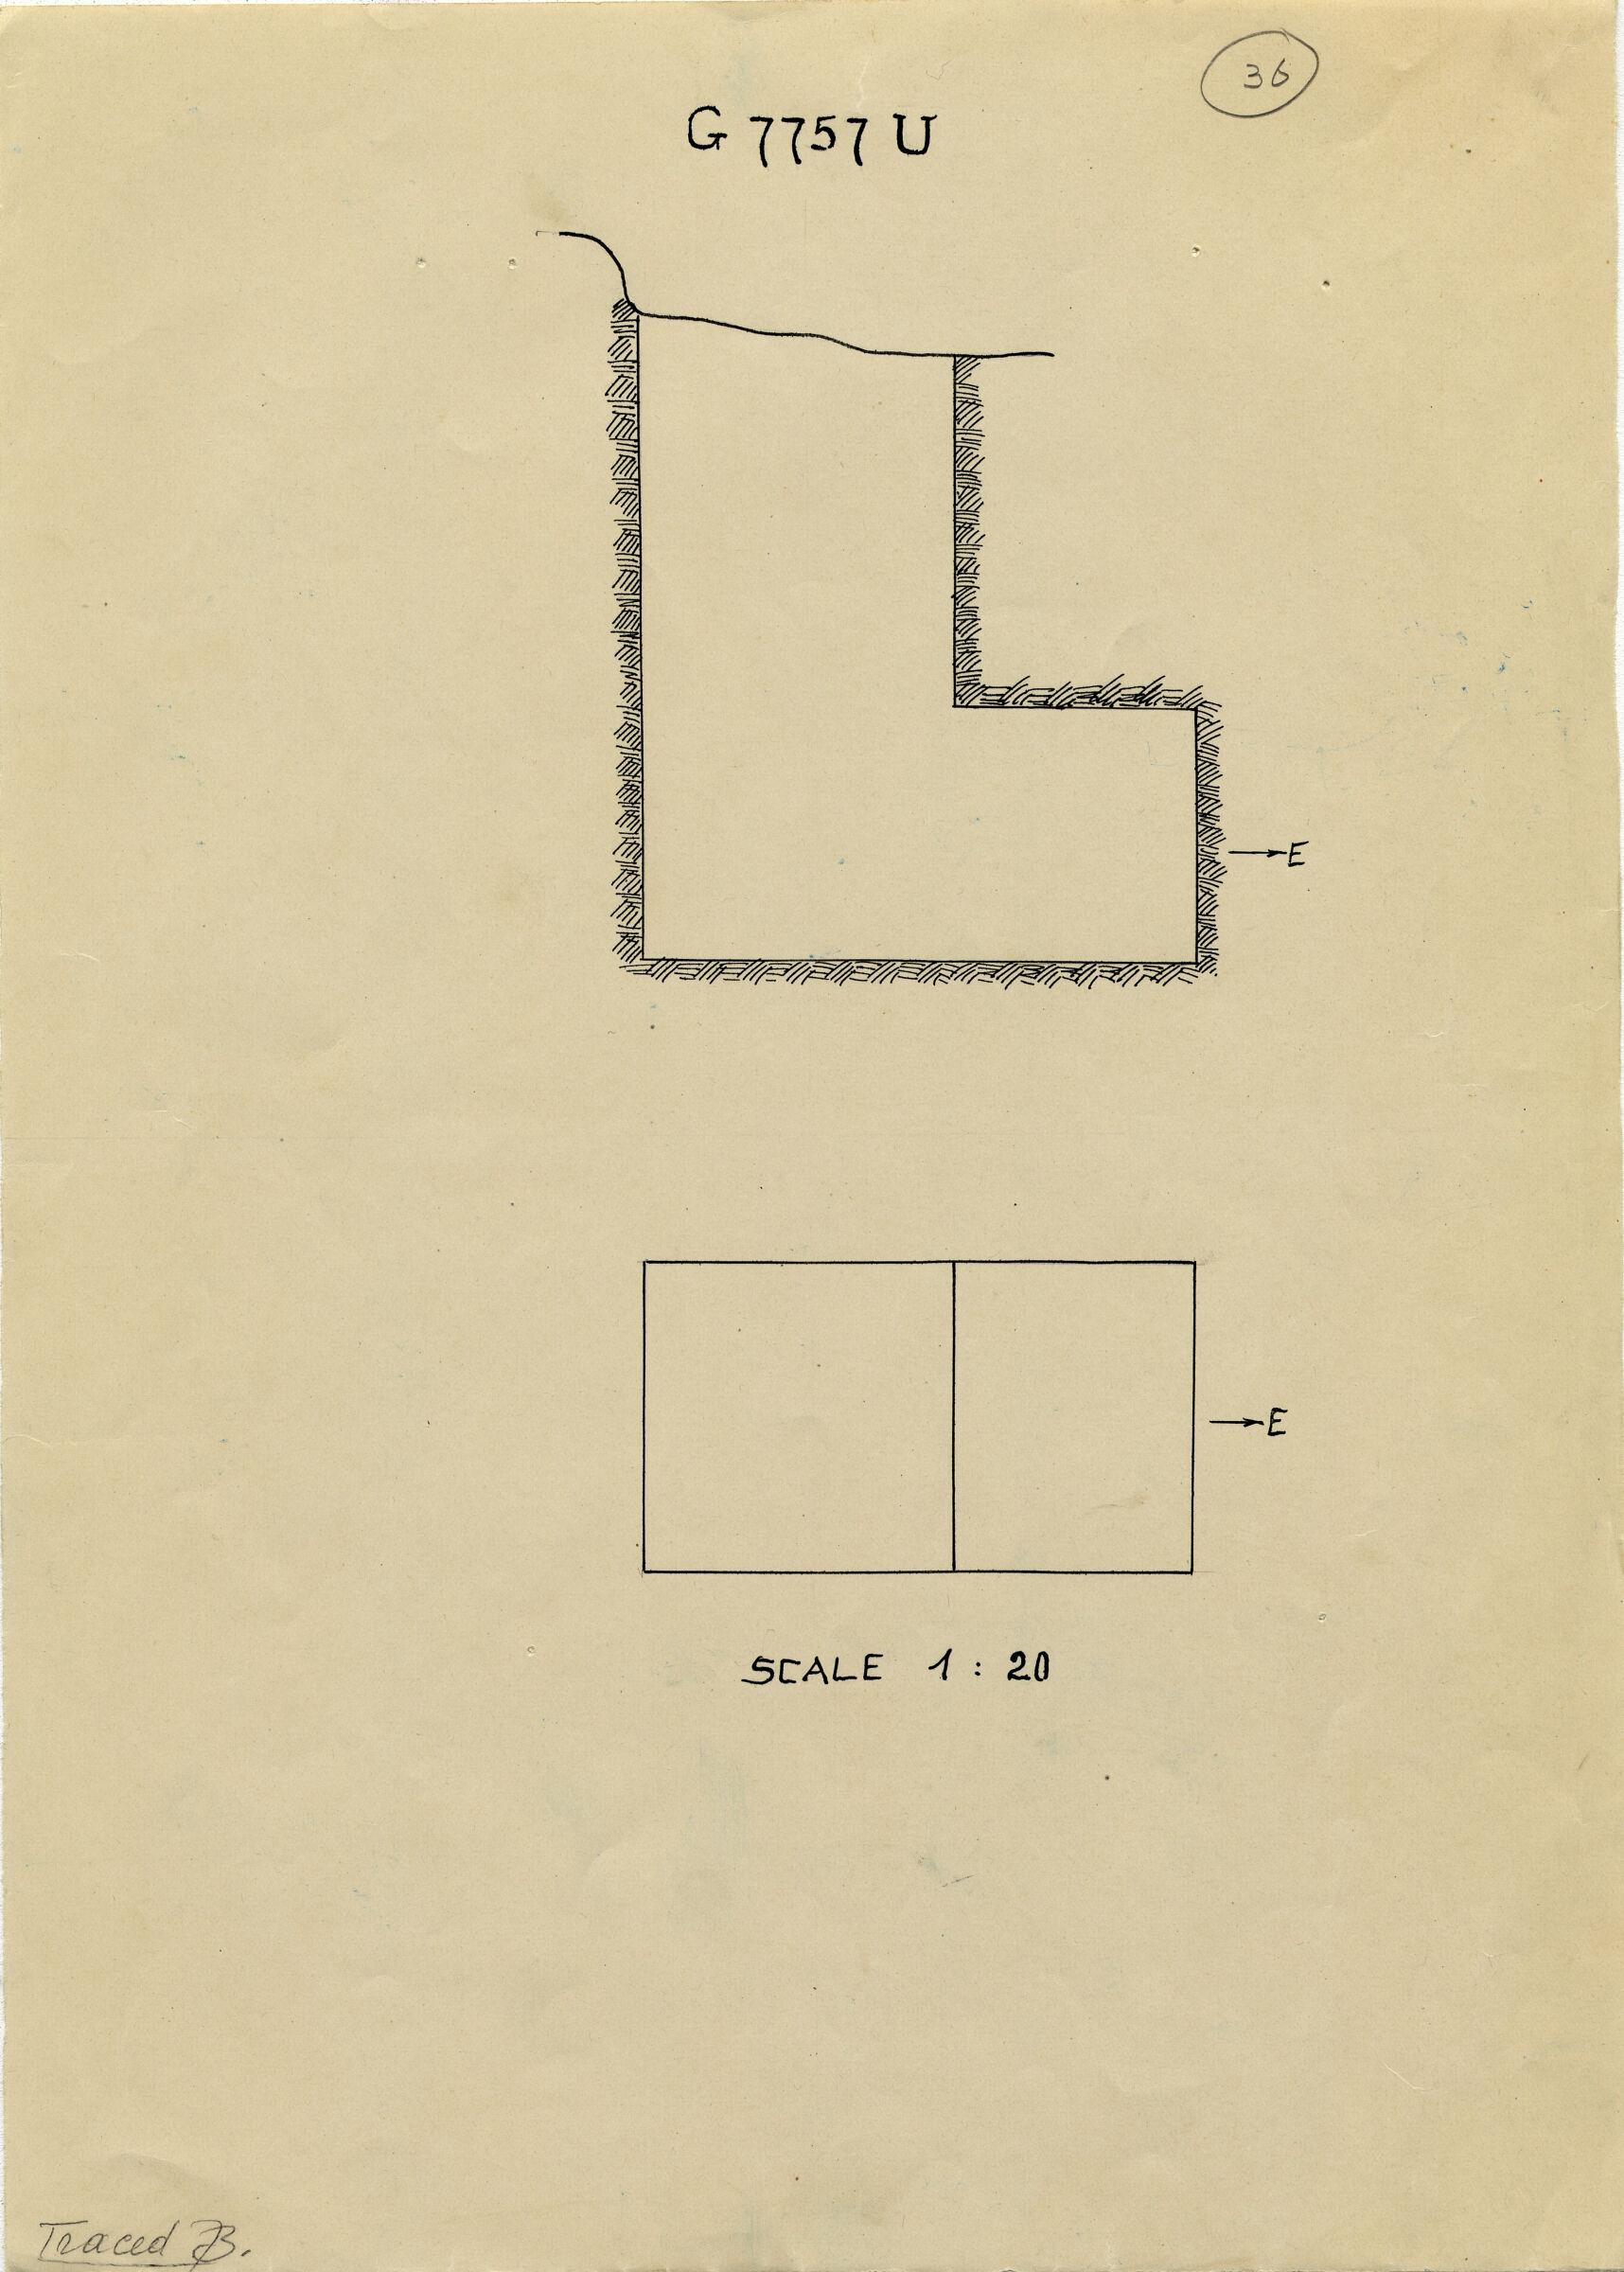 Maps and plans: G 7757, Shaft U